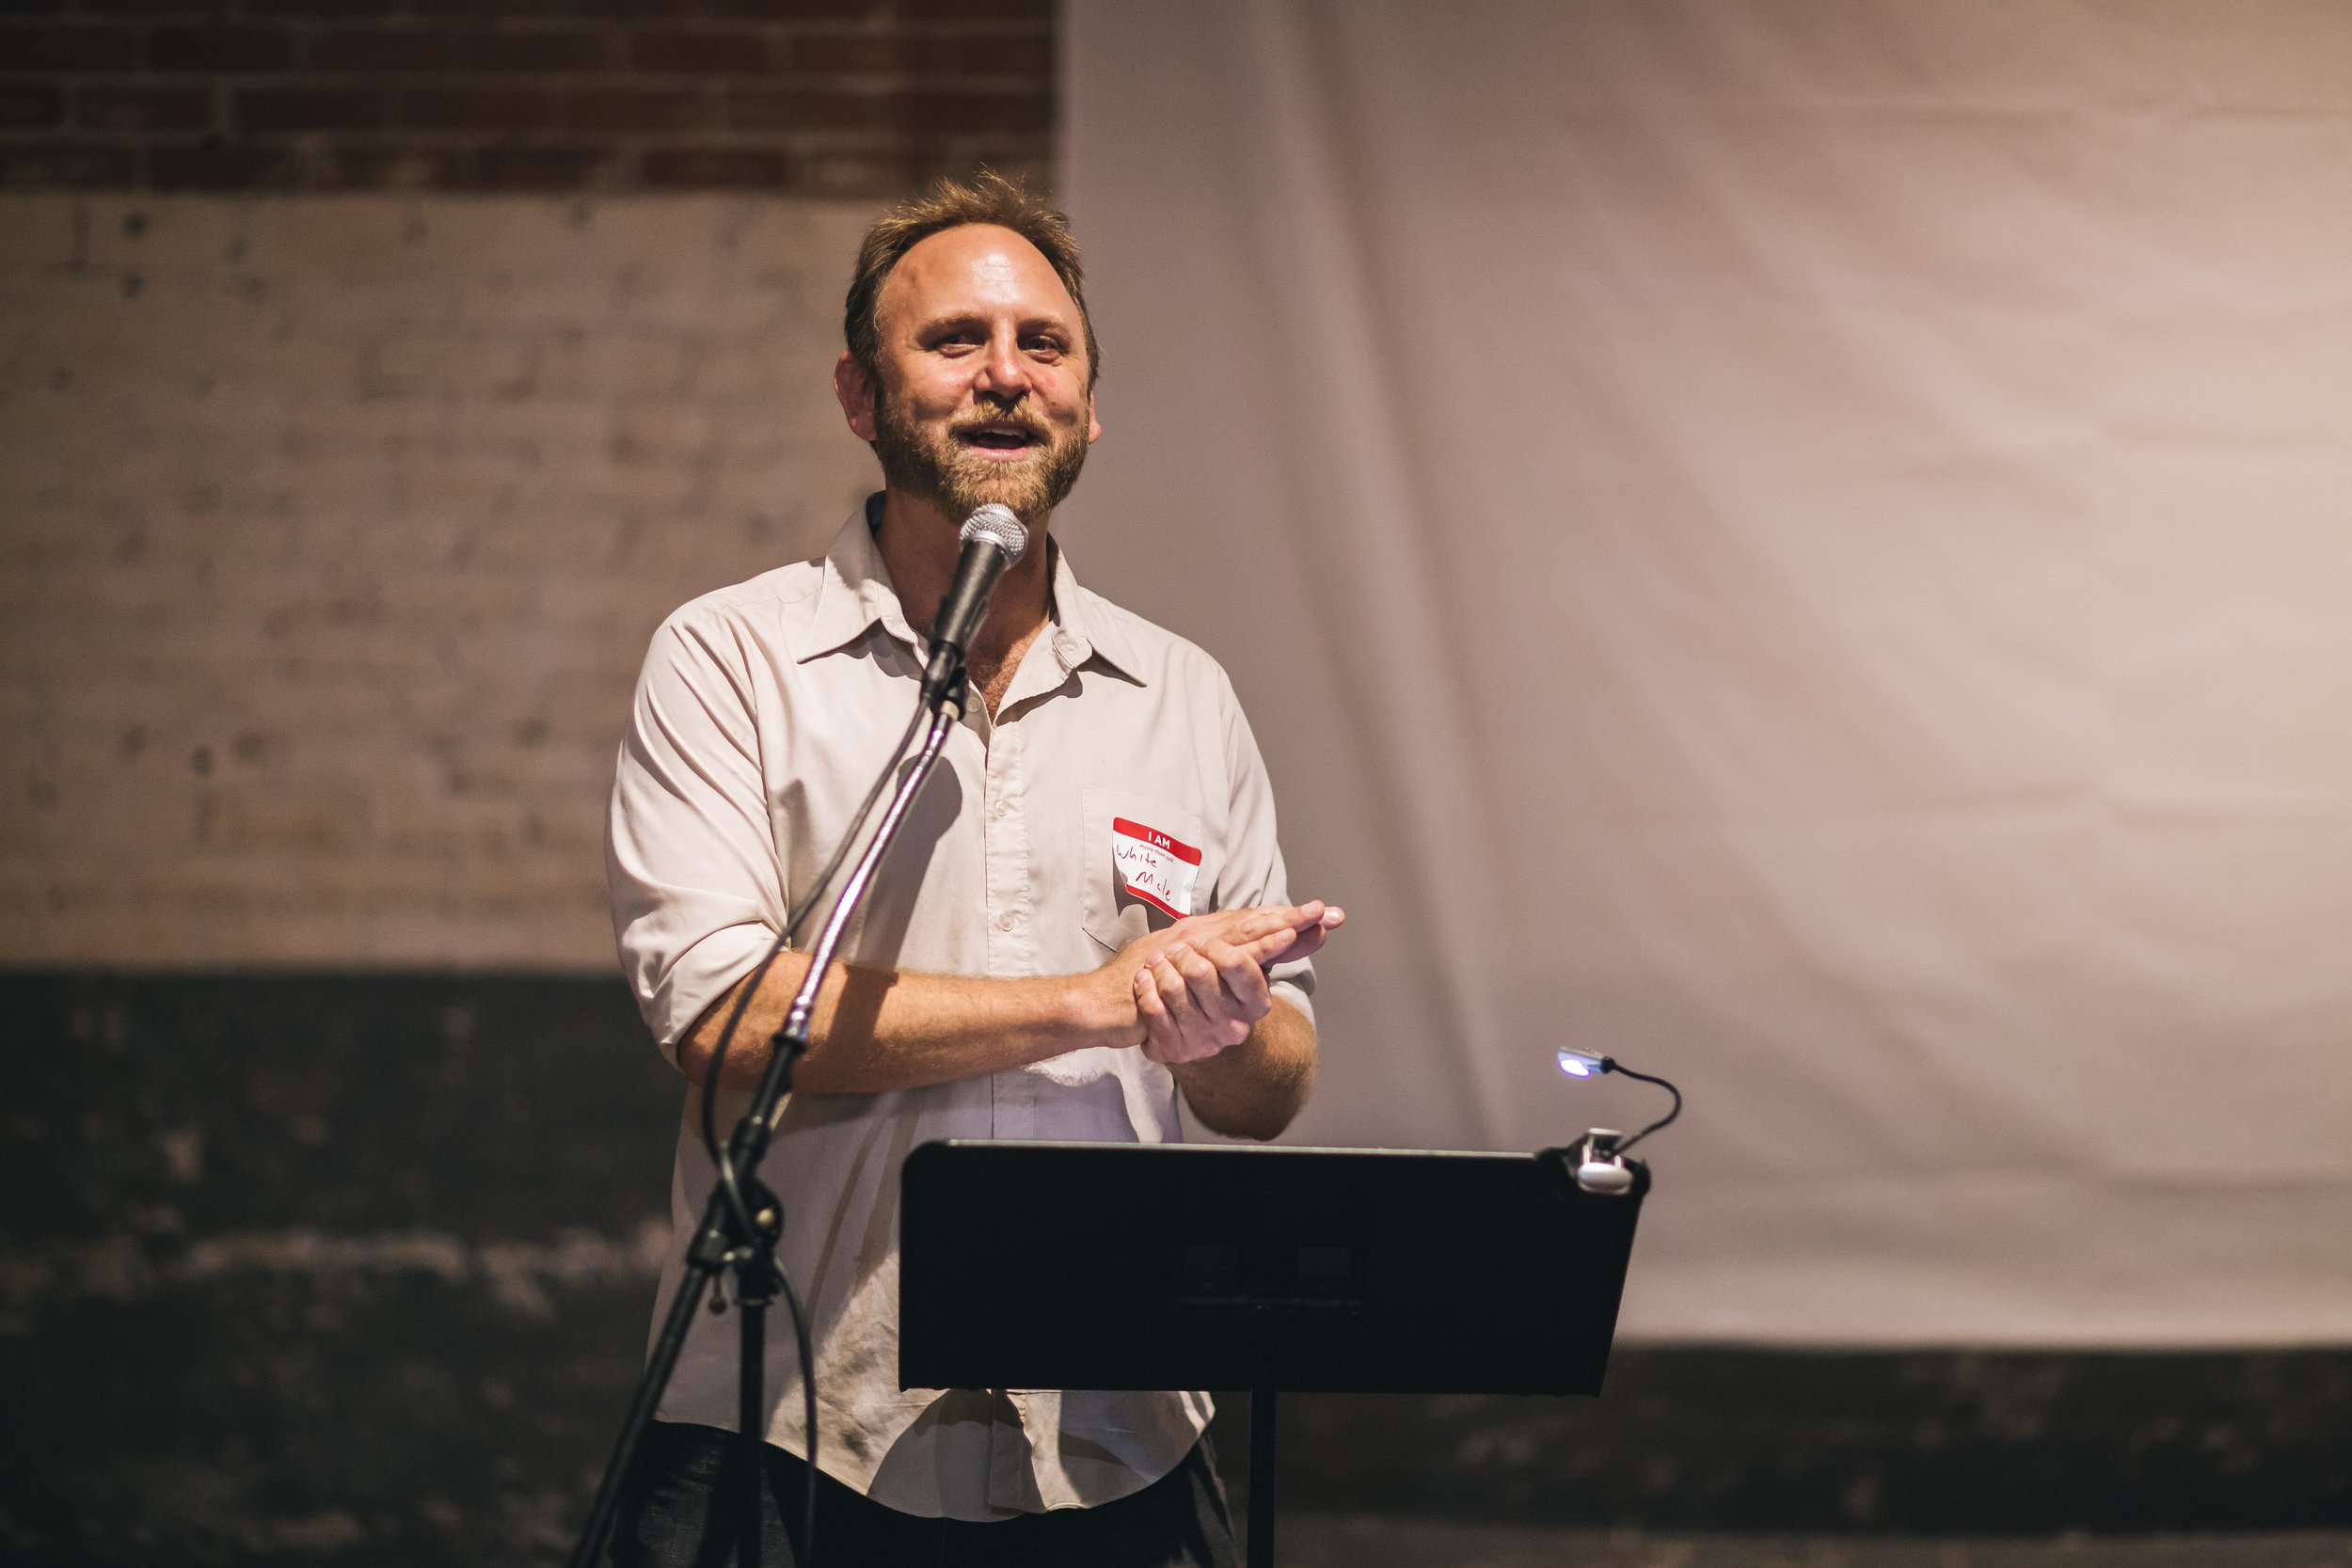 Nathan Young storytelling.jpg